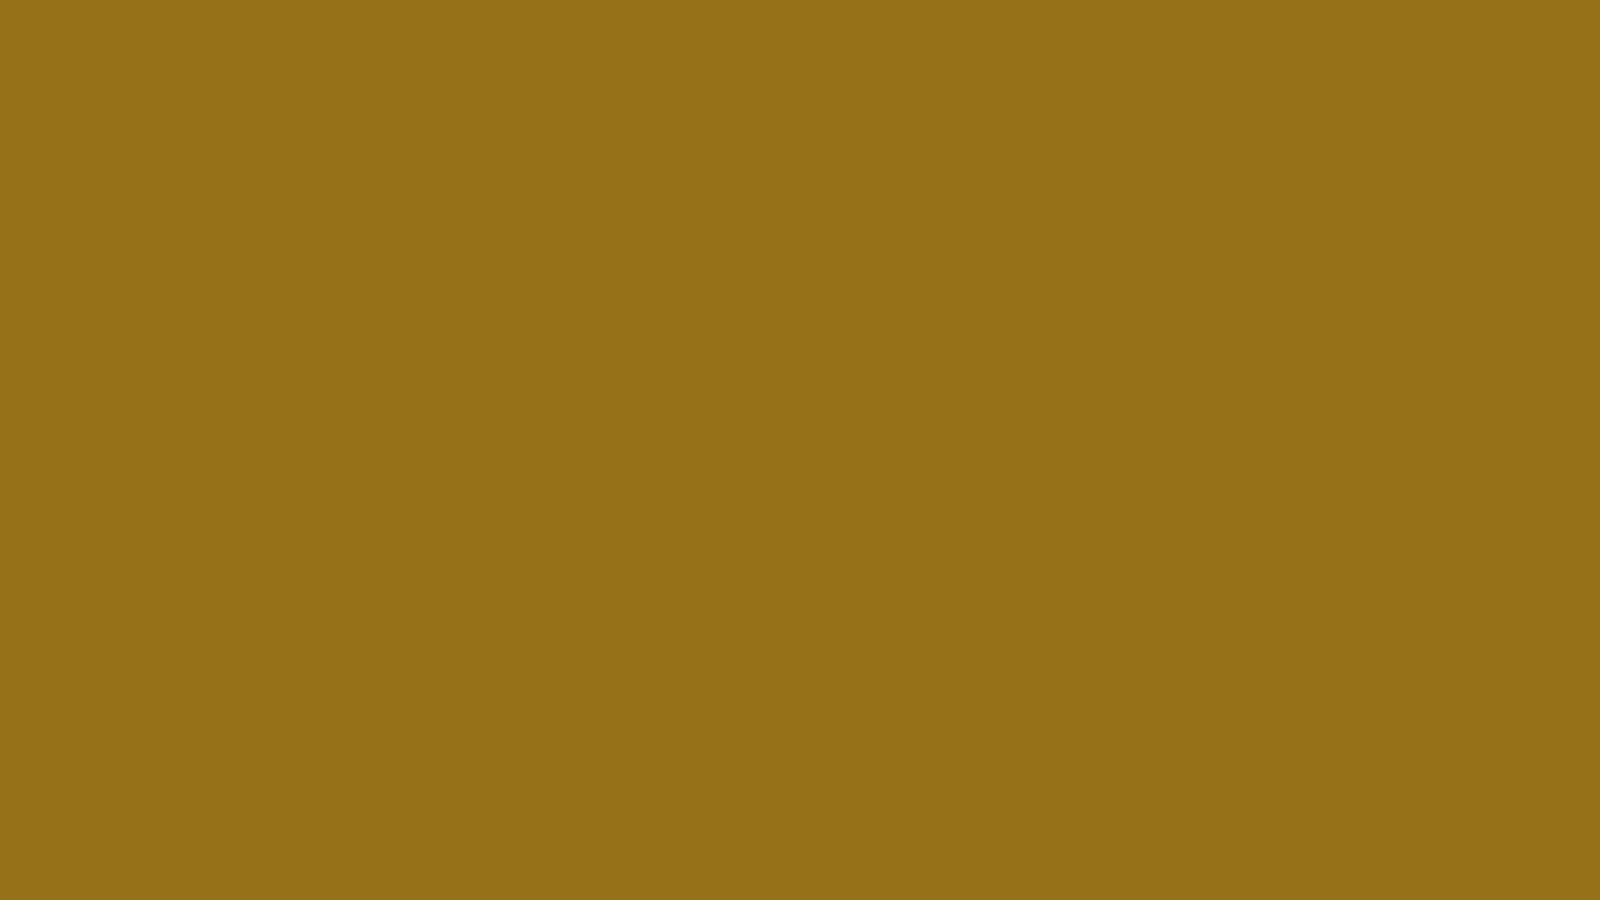 1600x900 Mode Beige Solid Color Background